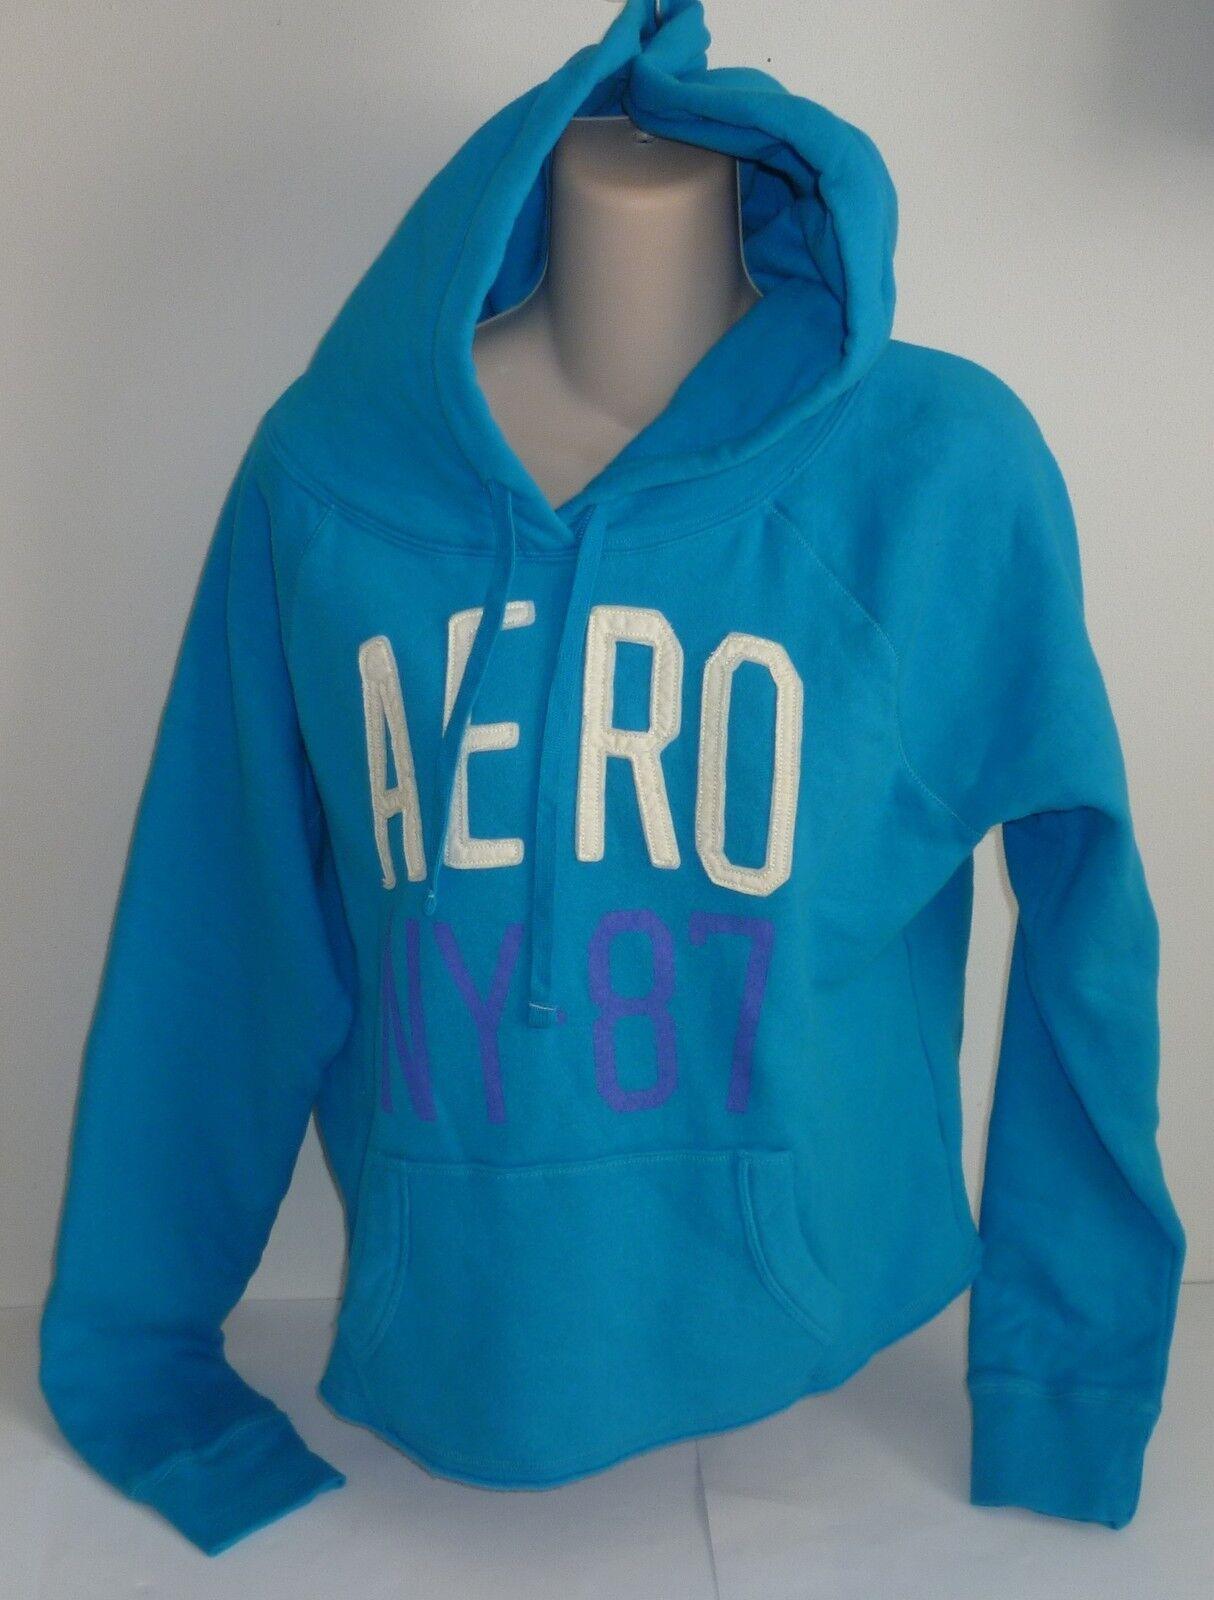 Womens AEROPOSTALE Aero NY-87 Cropped Popover Hoodie Hooded Sweatshirt NWT #1235